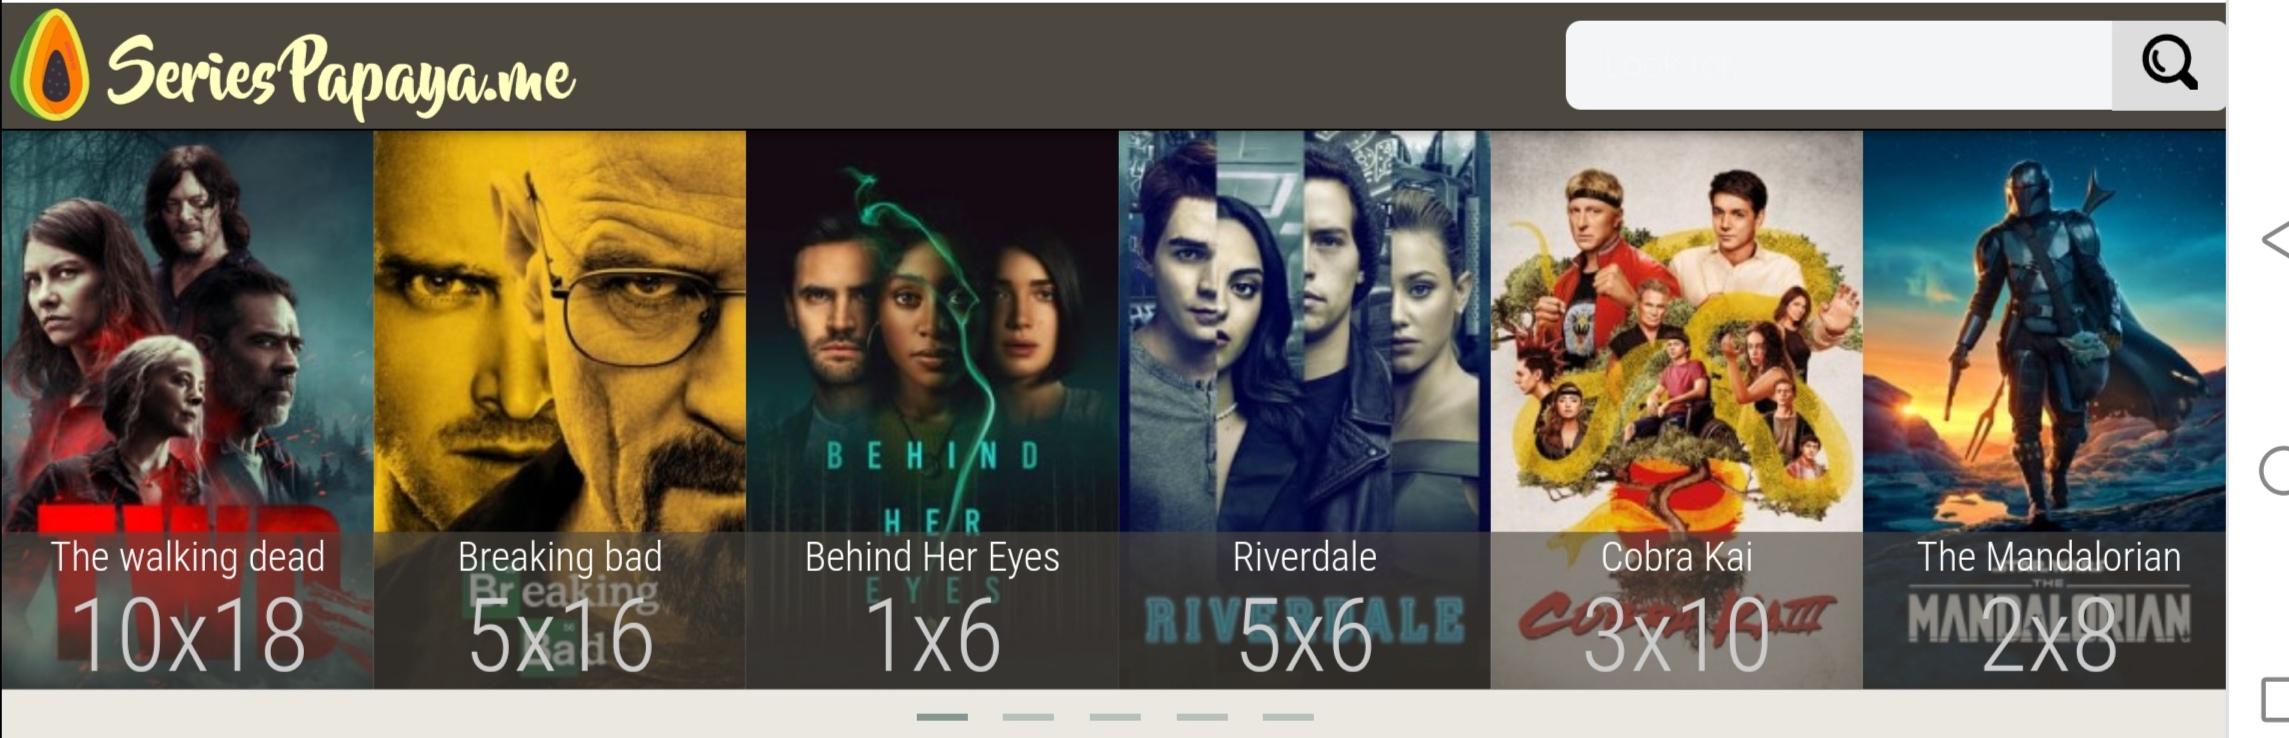 Seriespapaya movies HD download free